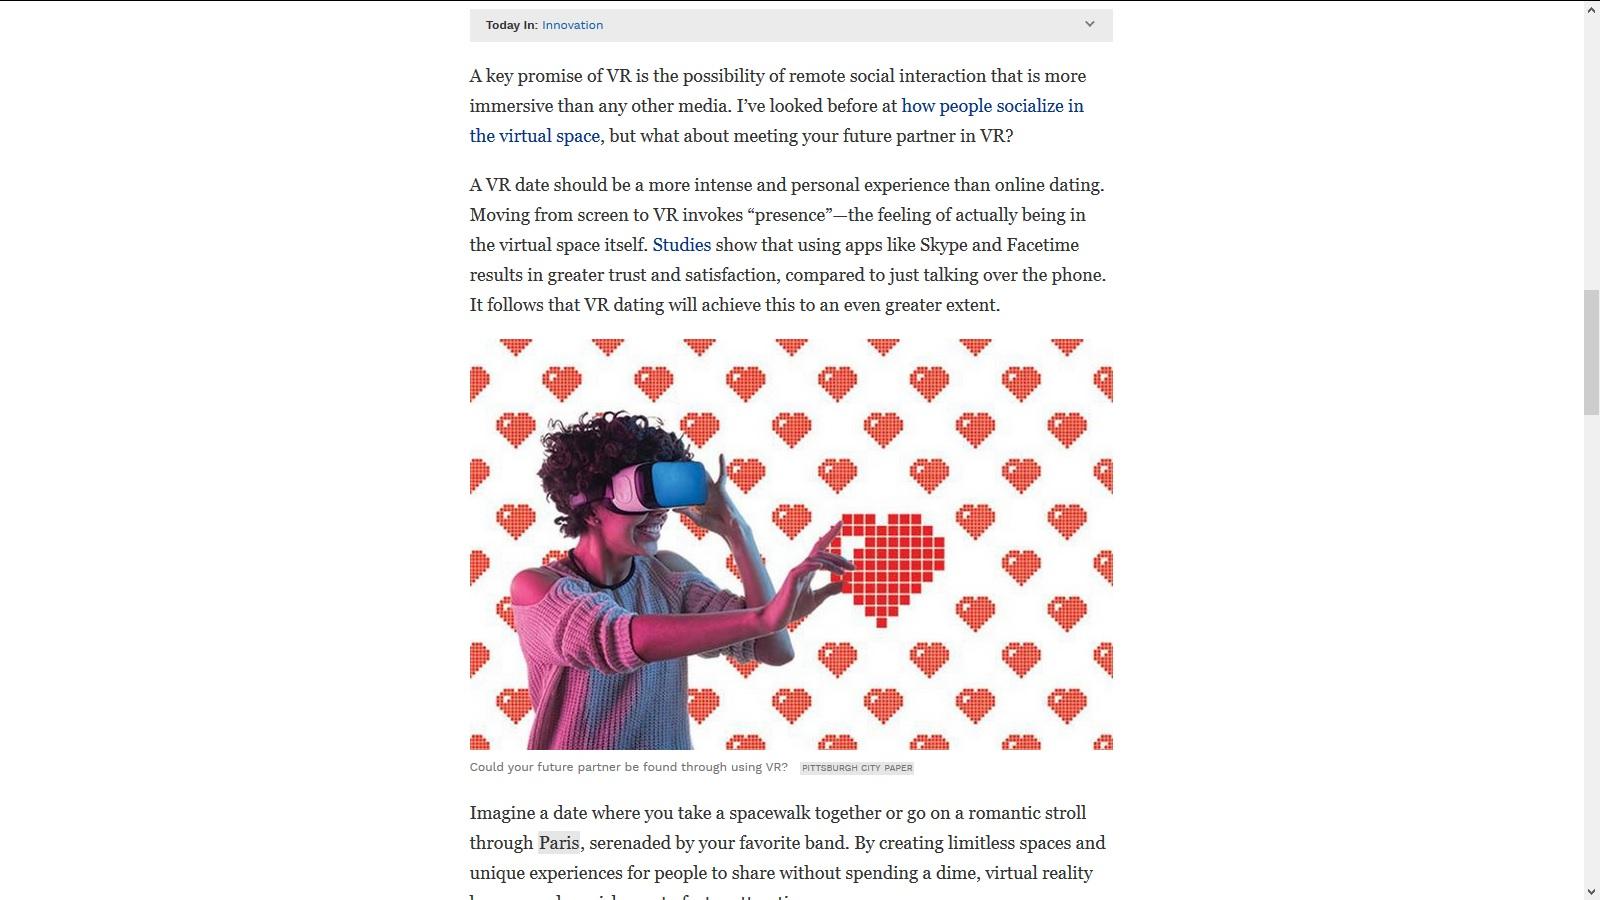 online dating reality show vtipné datovania profil odpovede